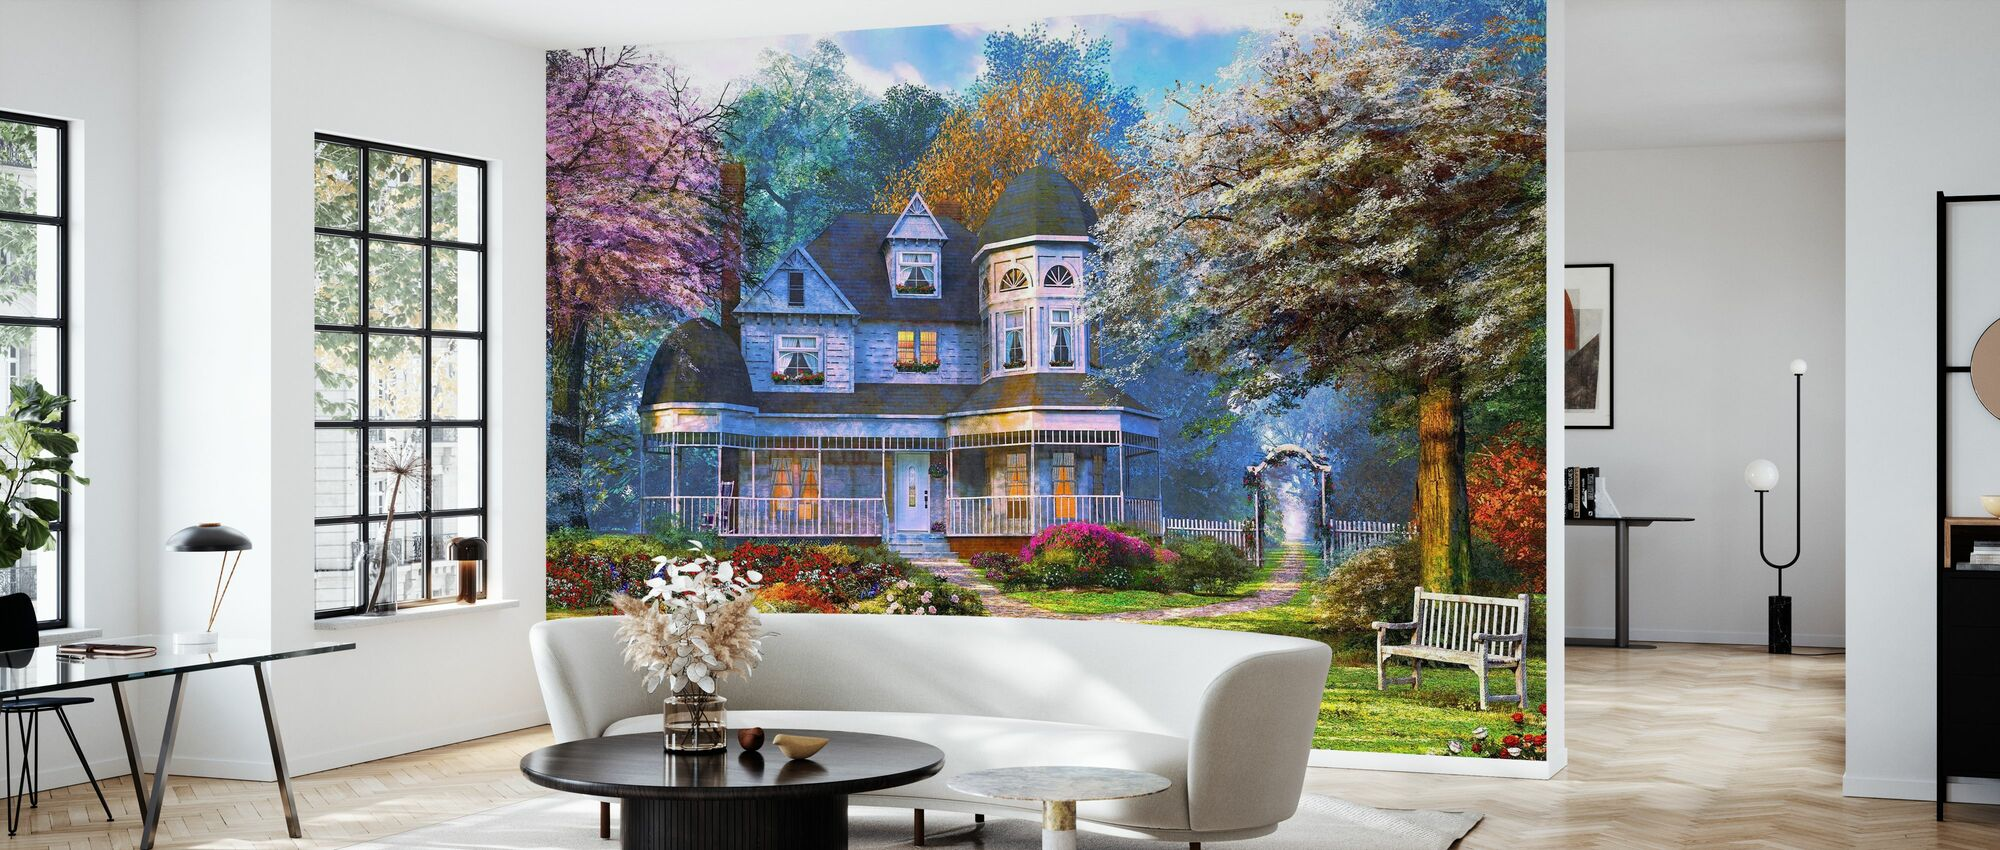 Victorian Home - Wallpaper - Living Room